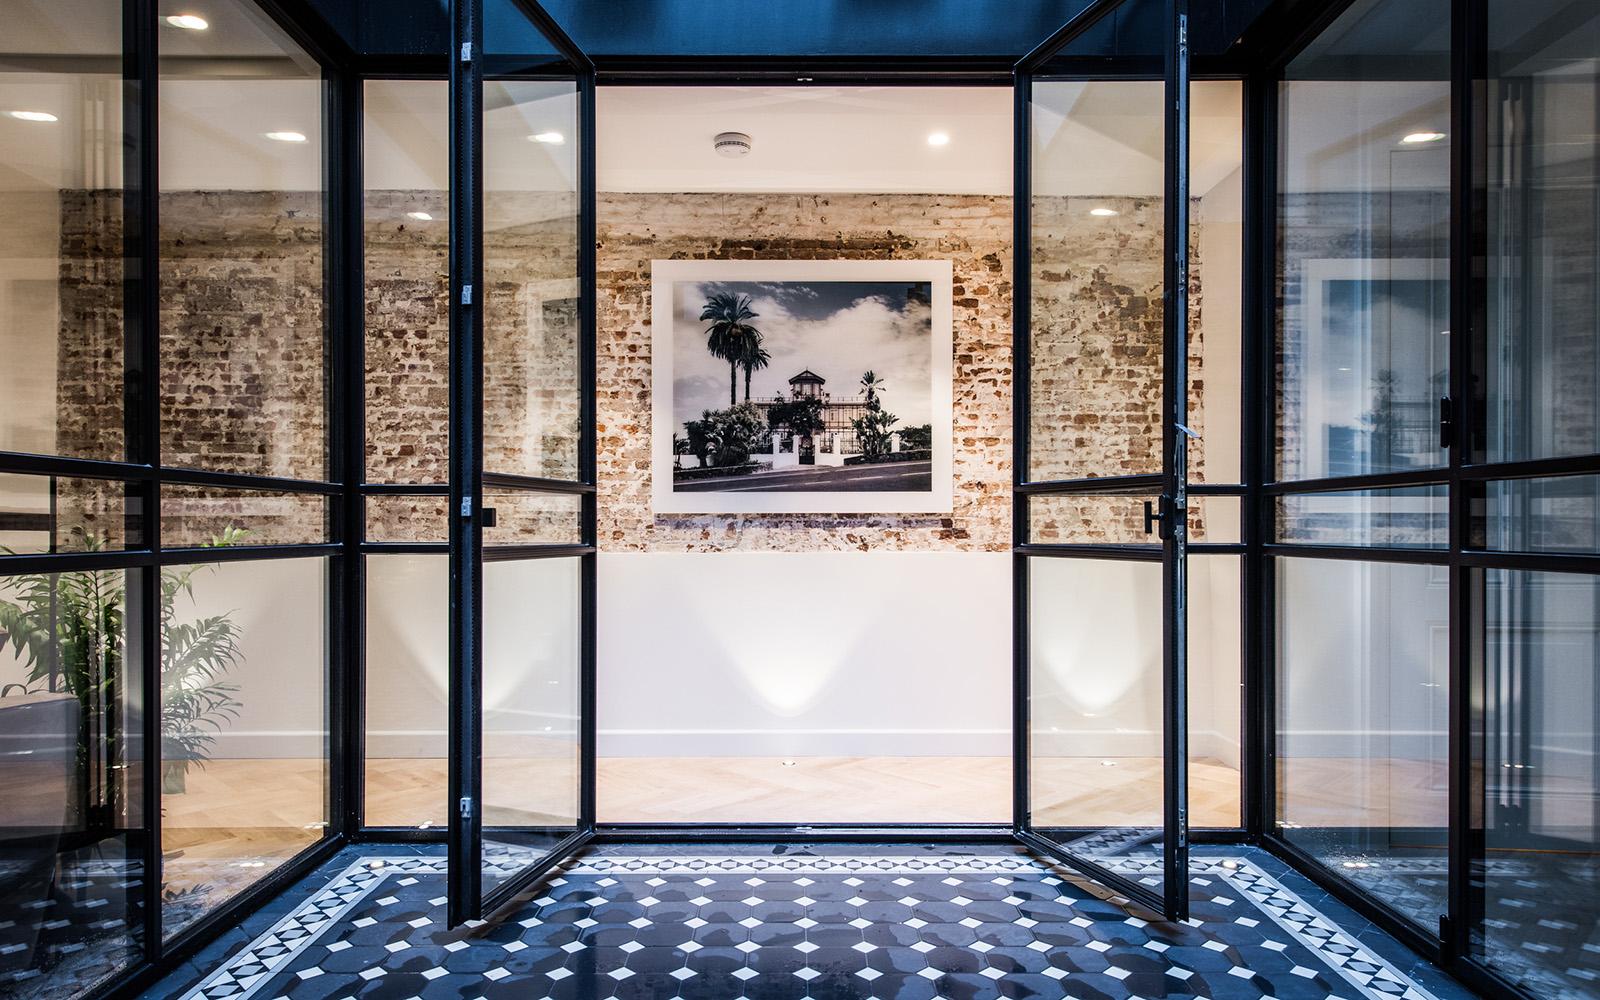 Co van der Horst, Prinseneiland, Amsterdam, Leem Wonen, The Art of Living Online